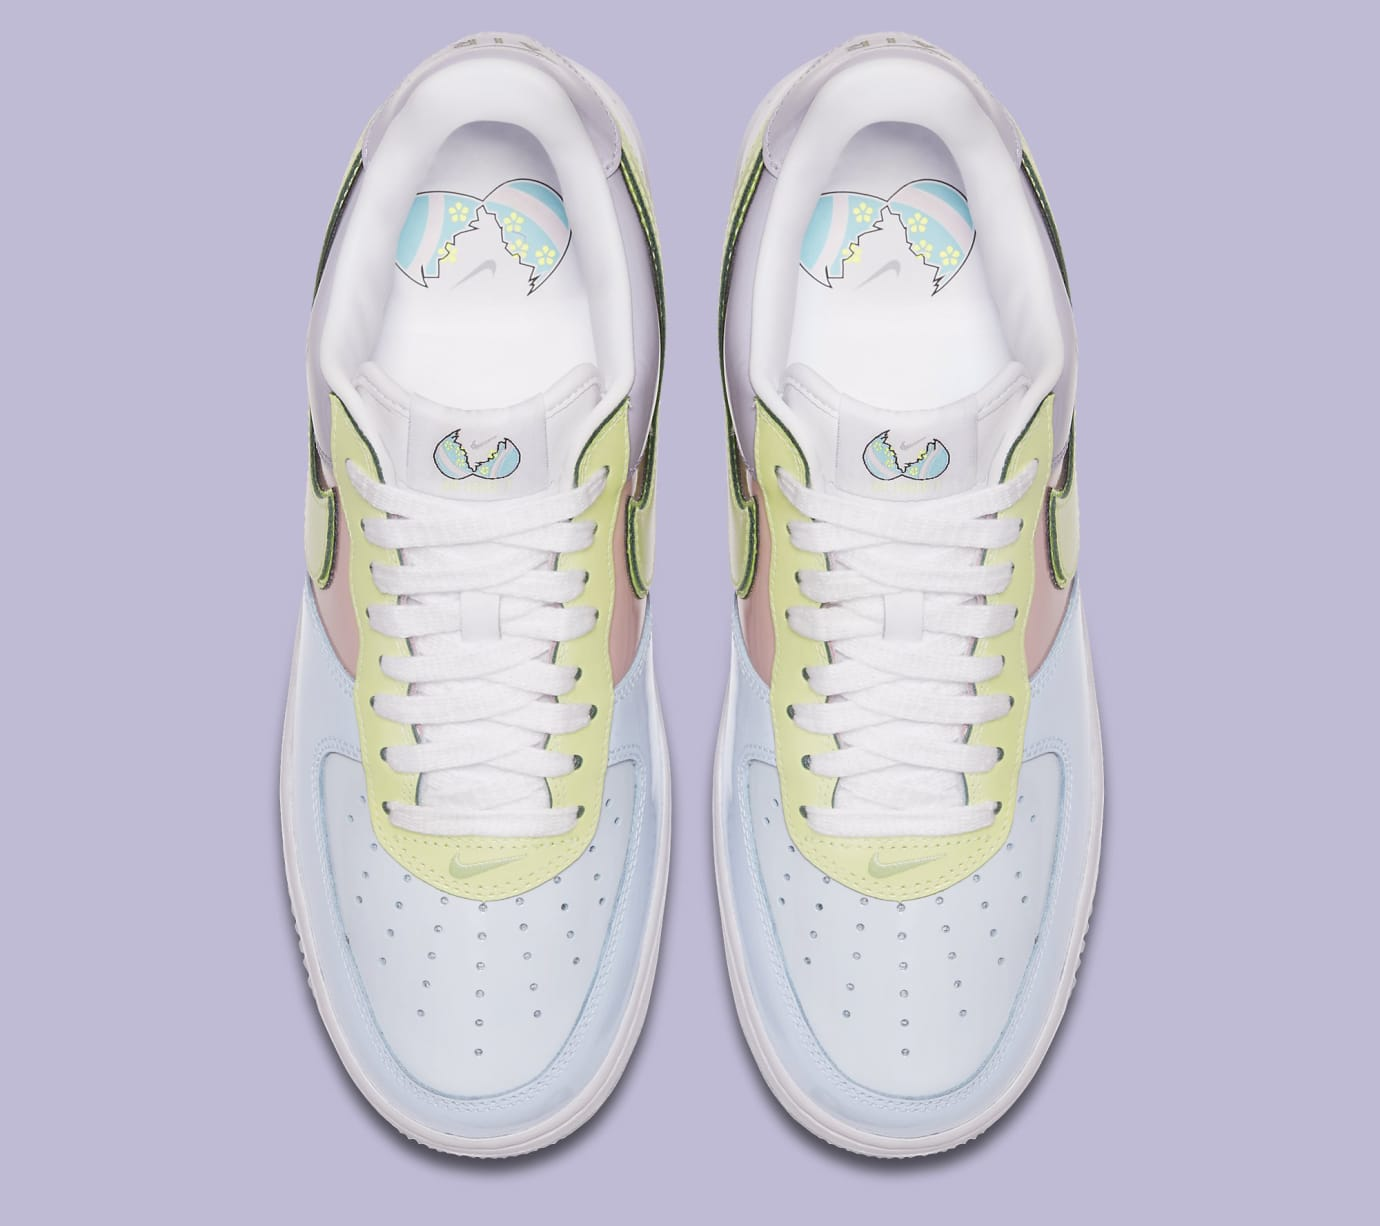 869a680fb19f Image via Nike Easter Egg Nike Air Force 1 2017 Top